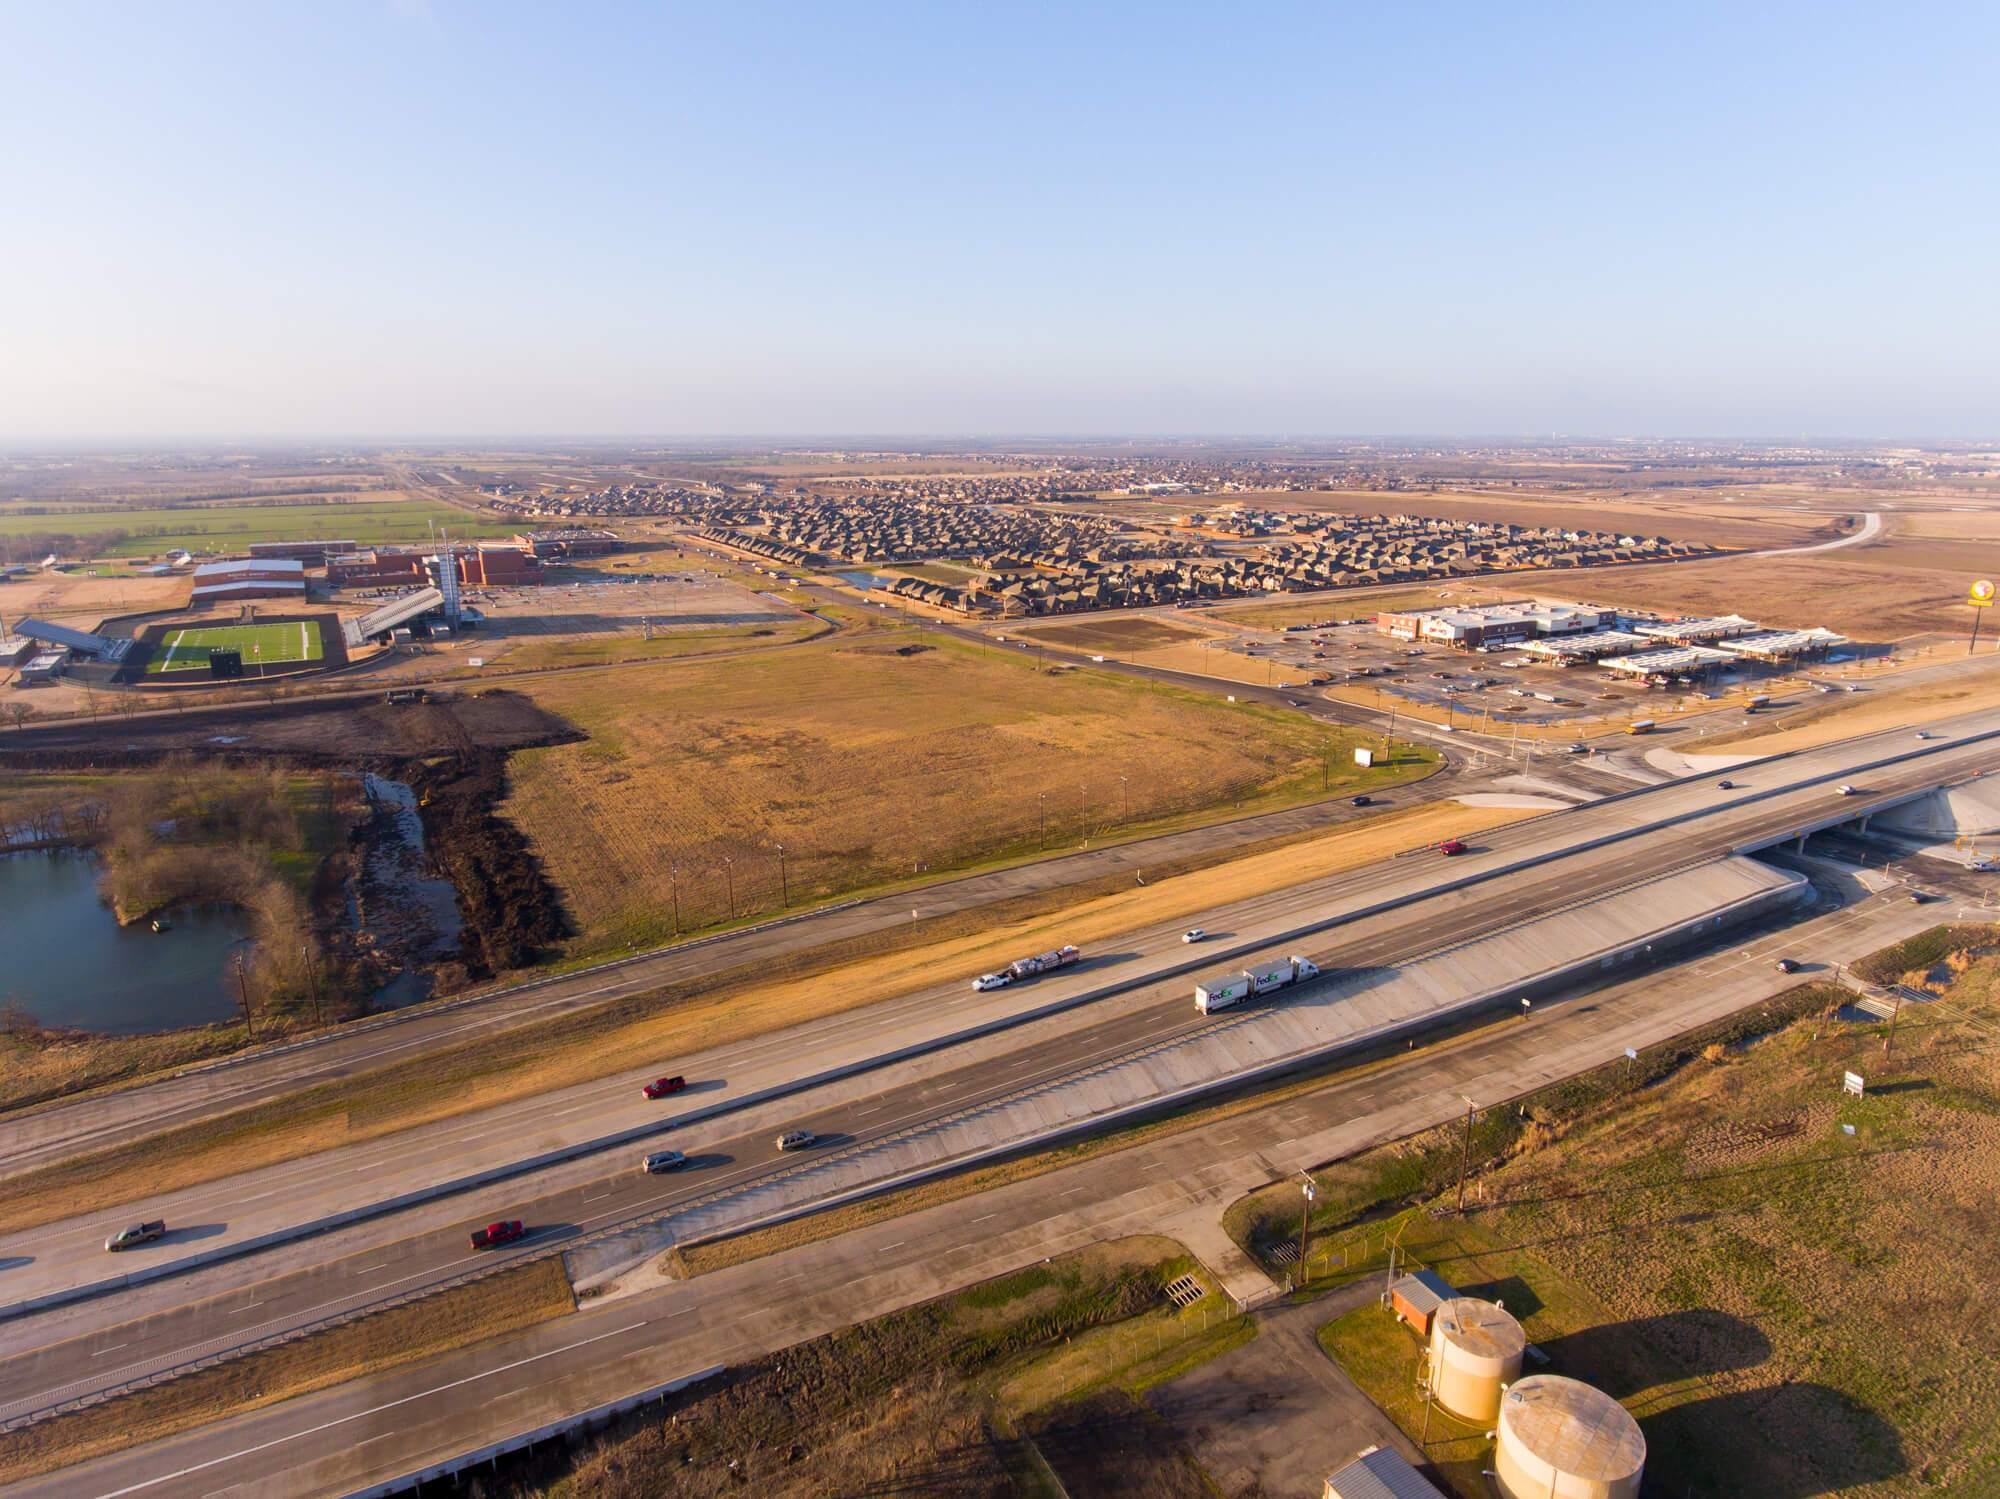 'DeBerry Reserve' by Meritage Homes: Dallas/Ft. ... in Dallas